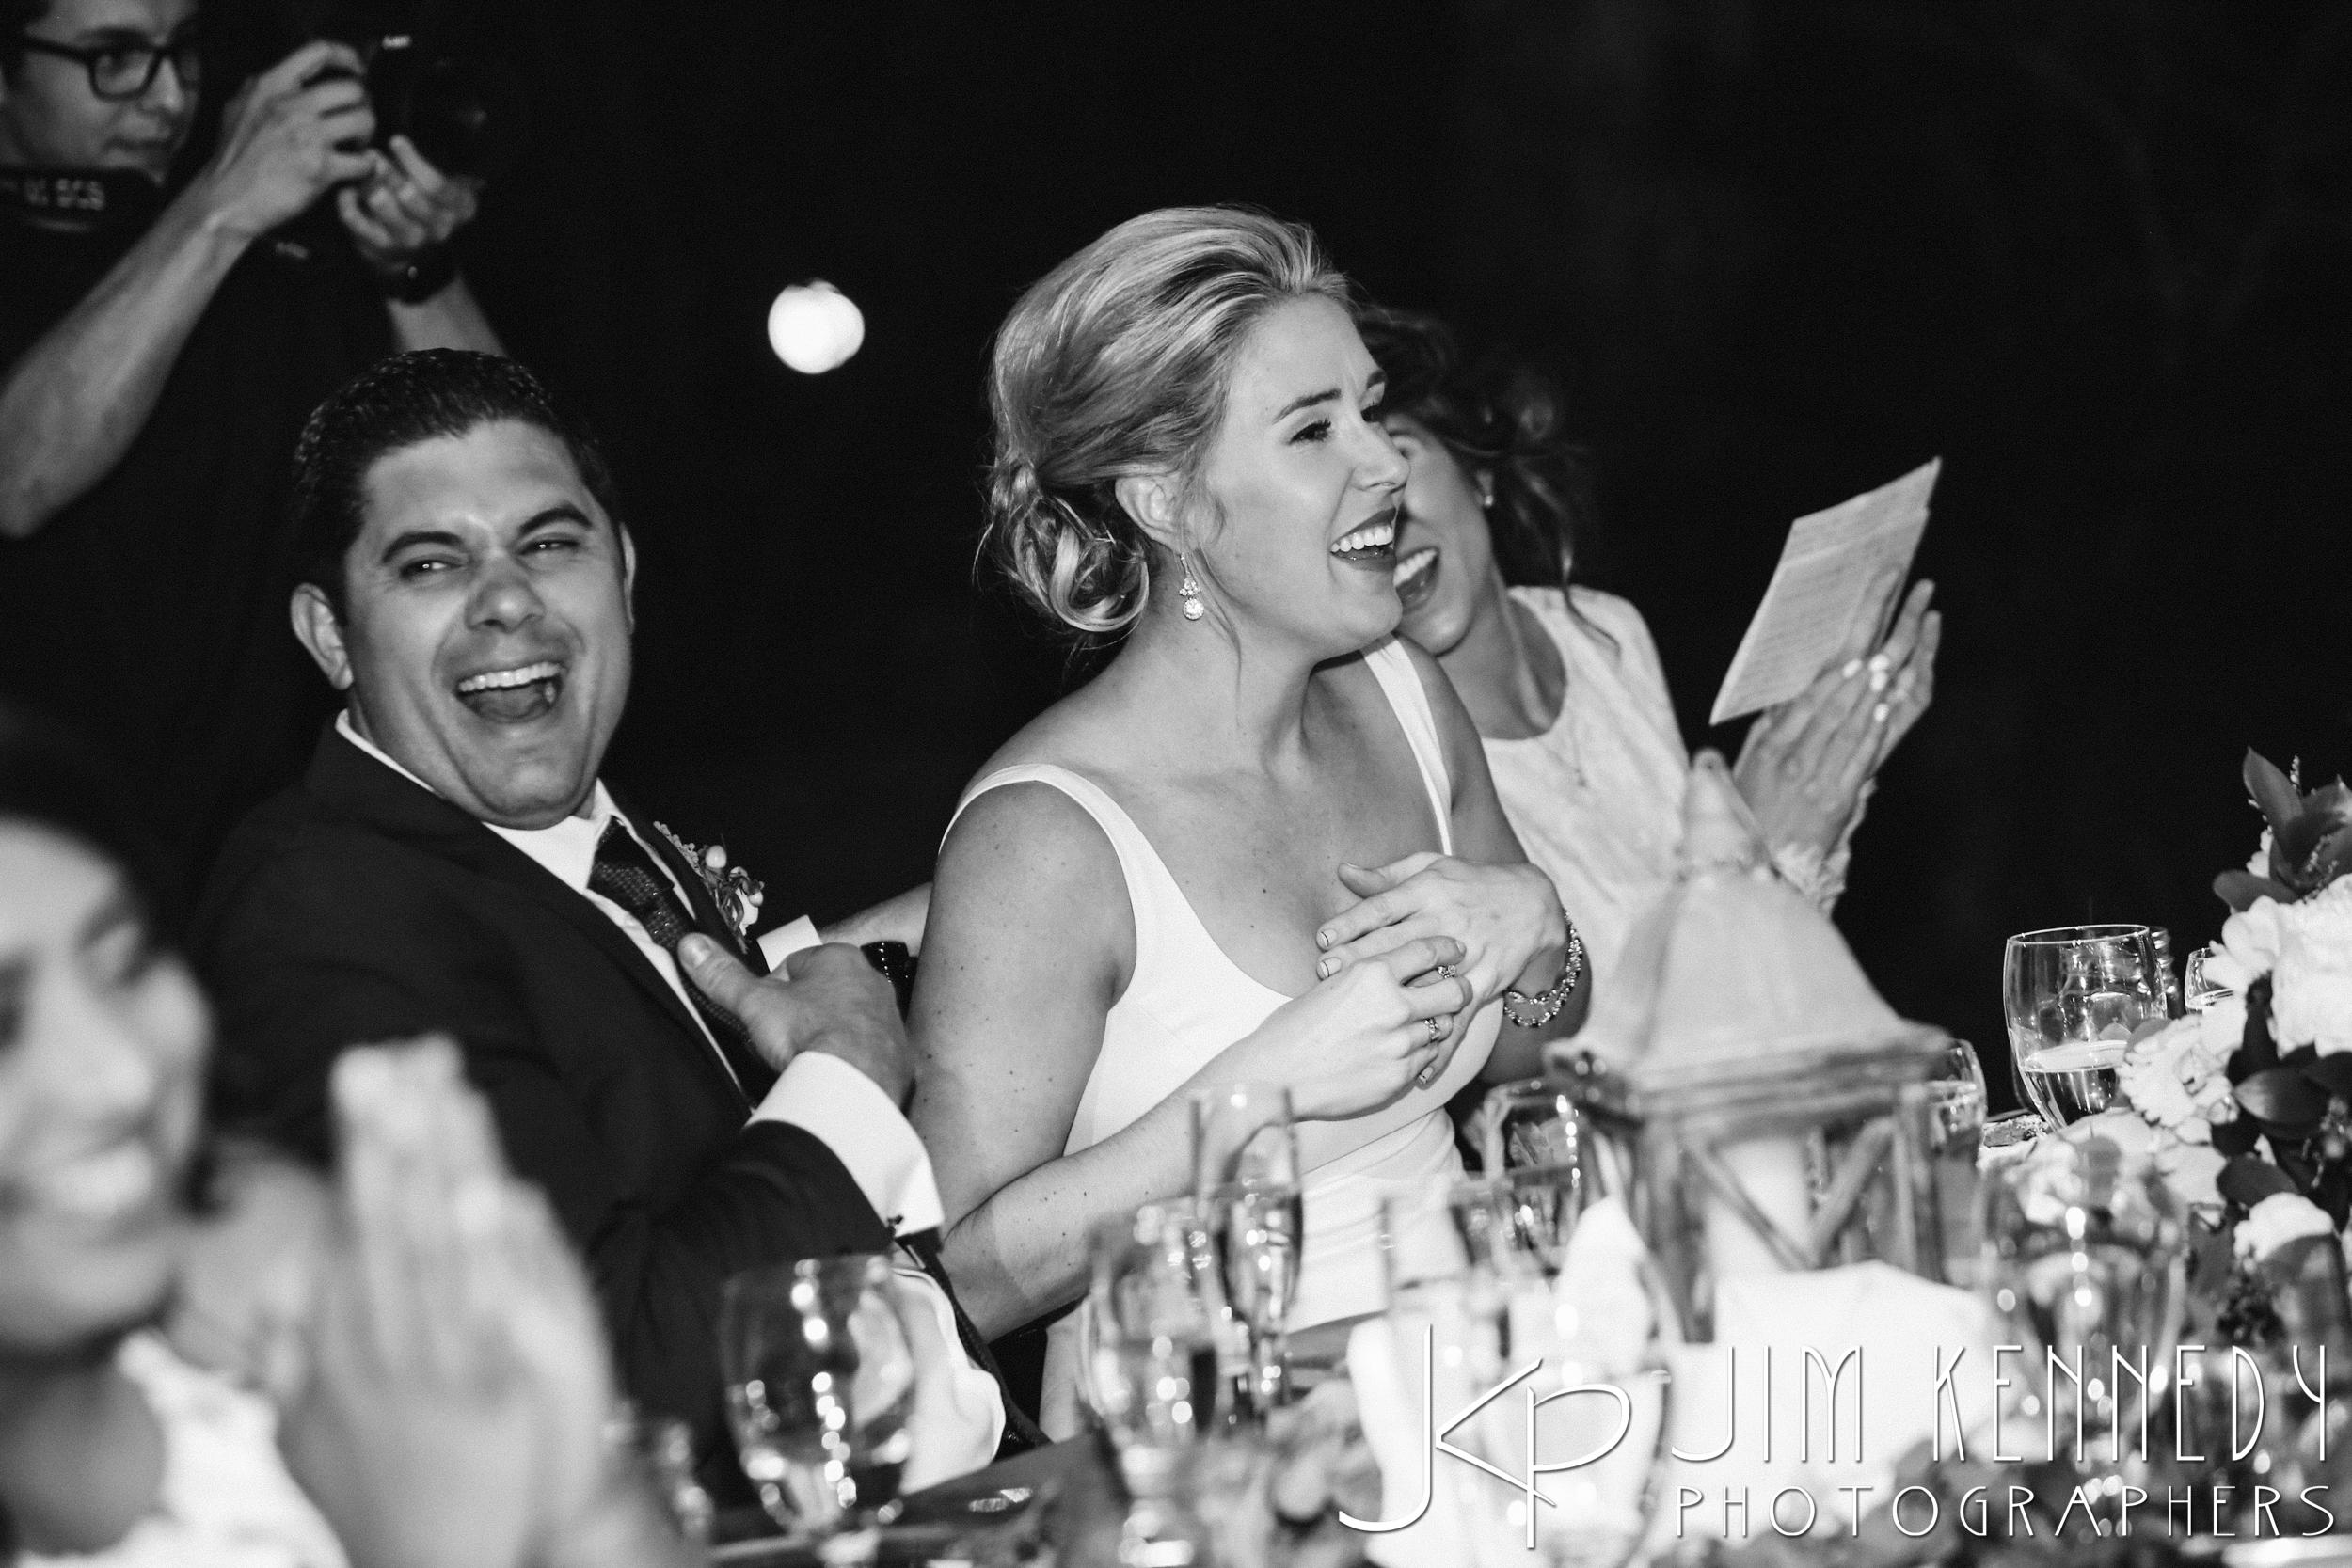 jim_kennedy_photographers_highland_springs_wedding_caitlyn_0185.jpg